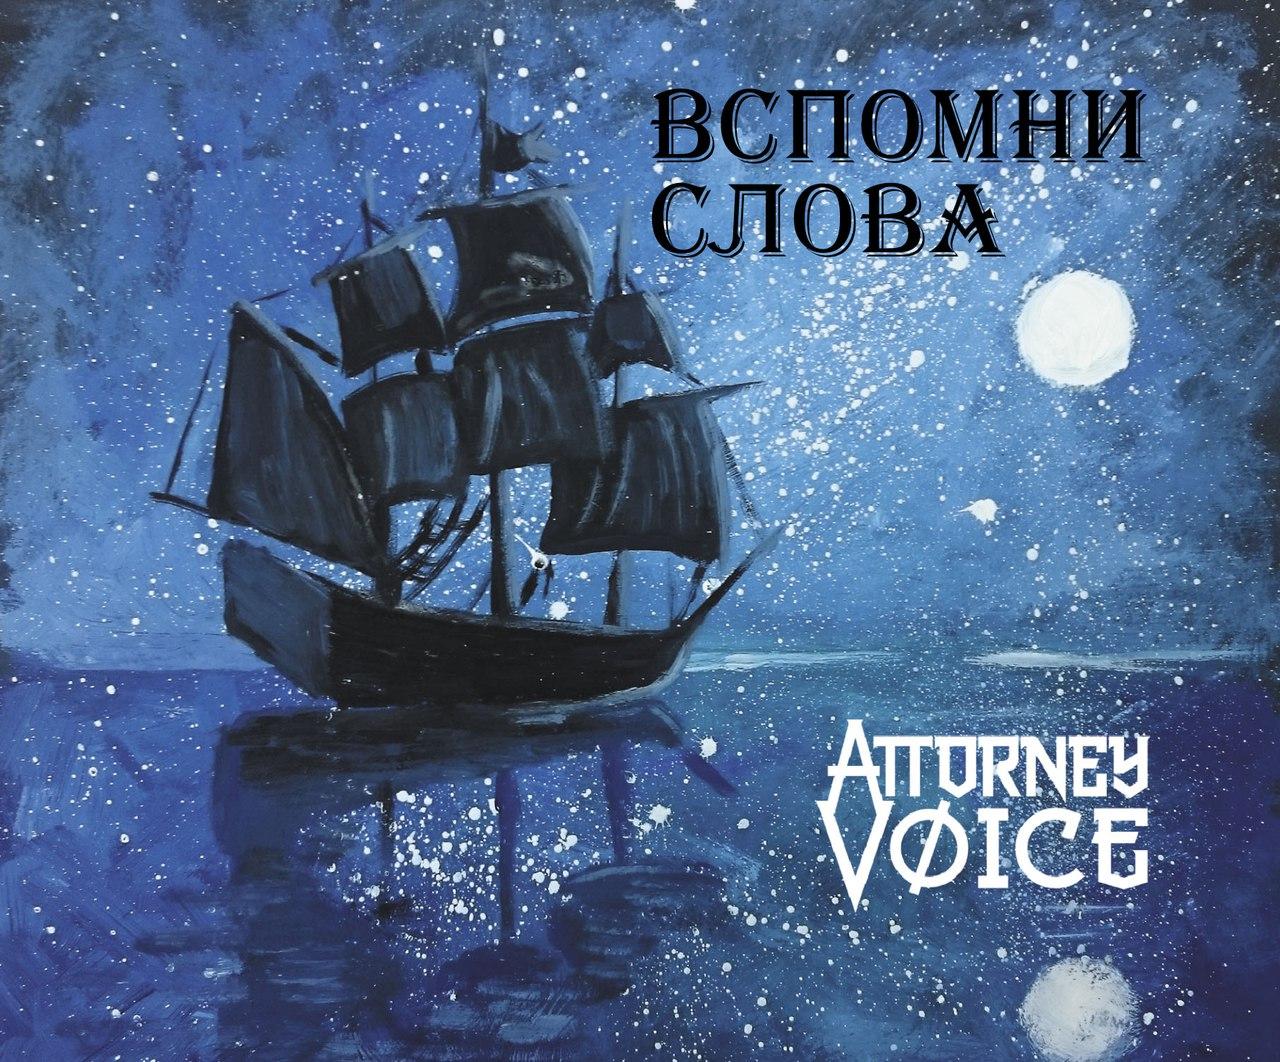 Attorney Voice - Вспомни Слова (2017)